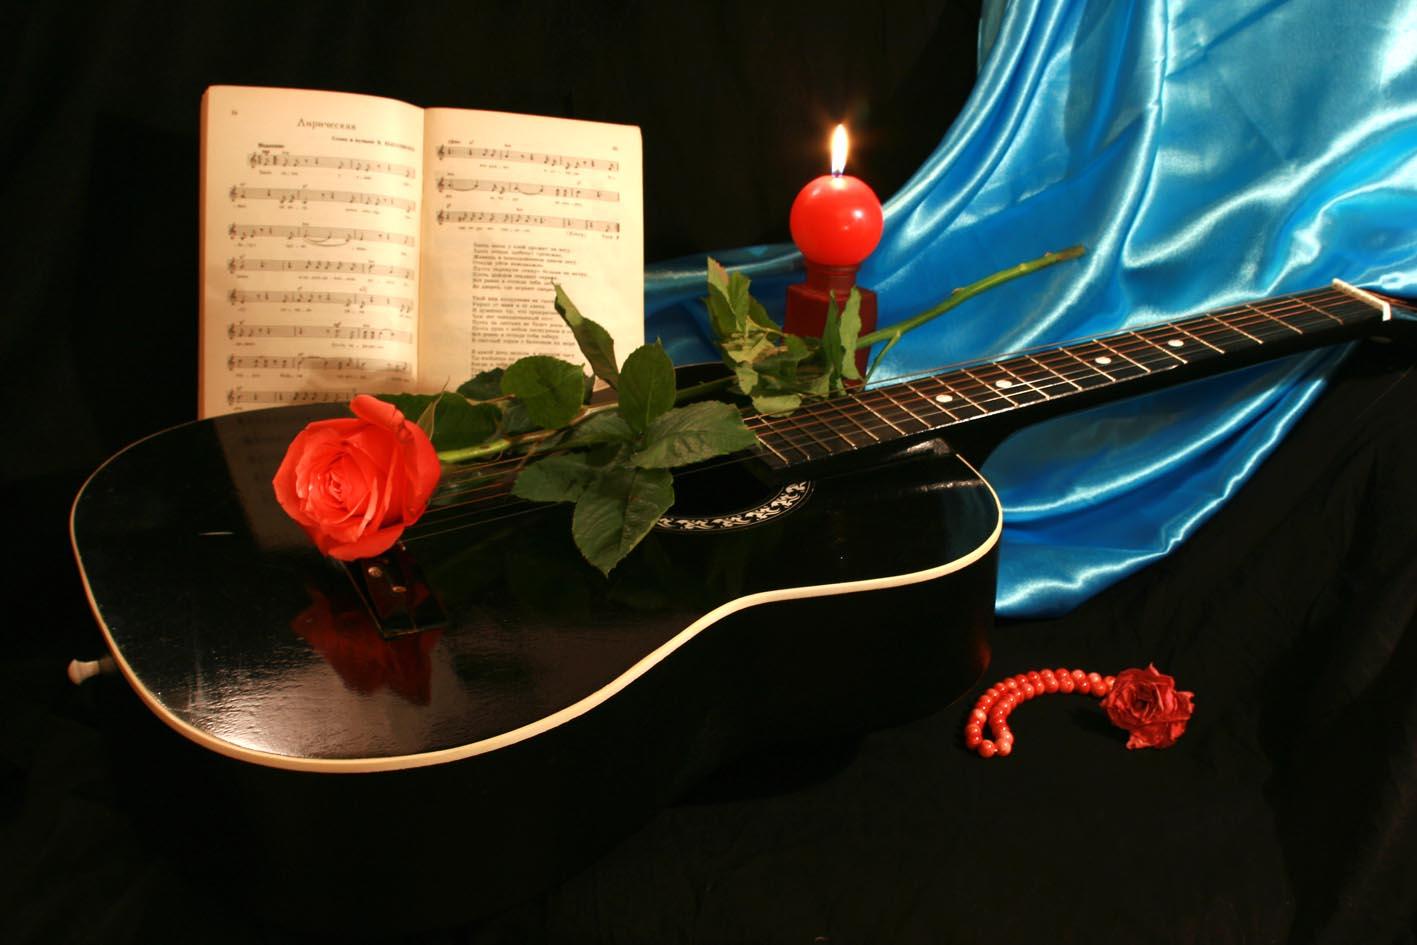 Вечер памяти музыканта сценарий